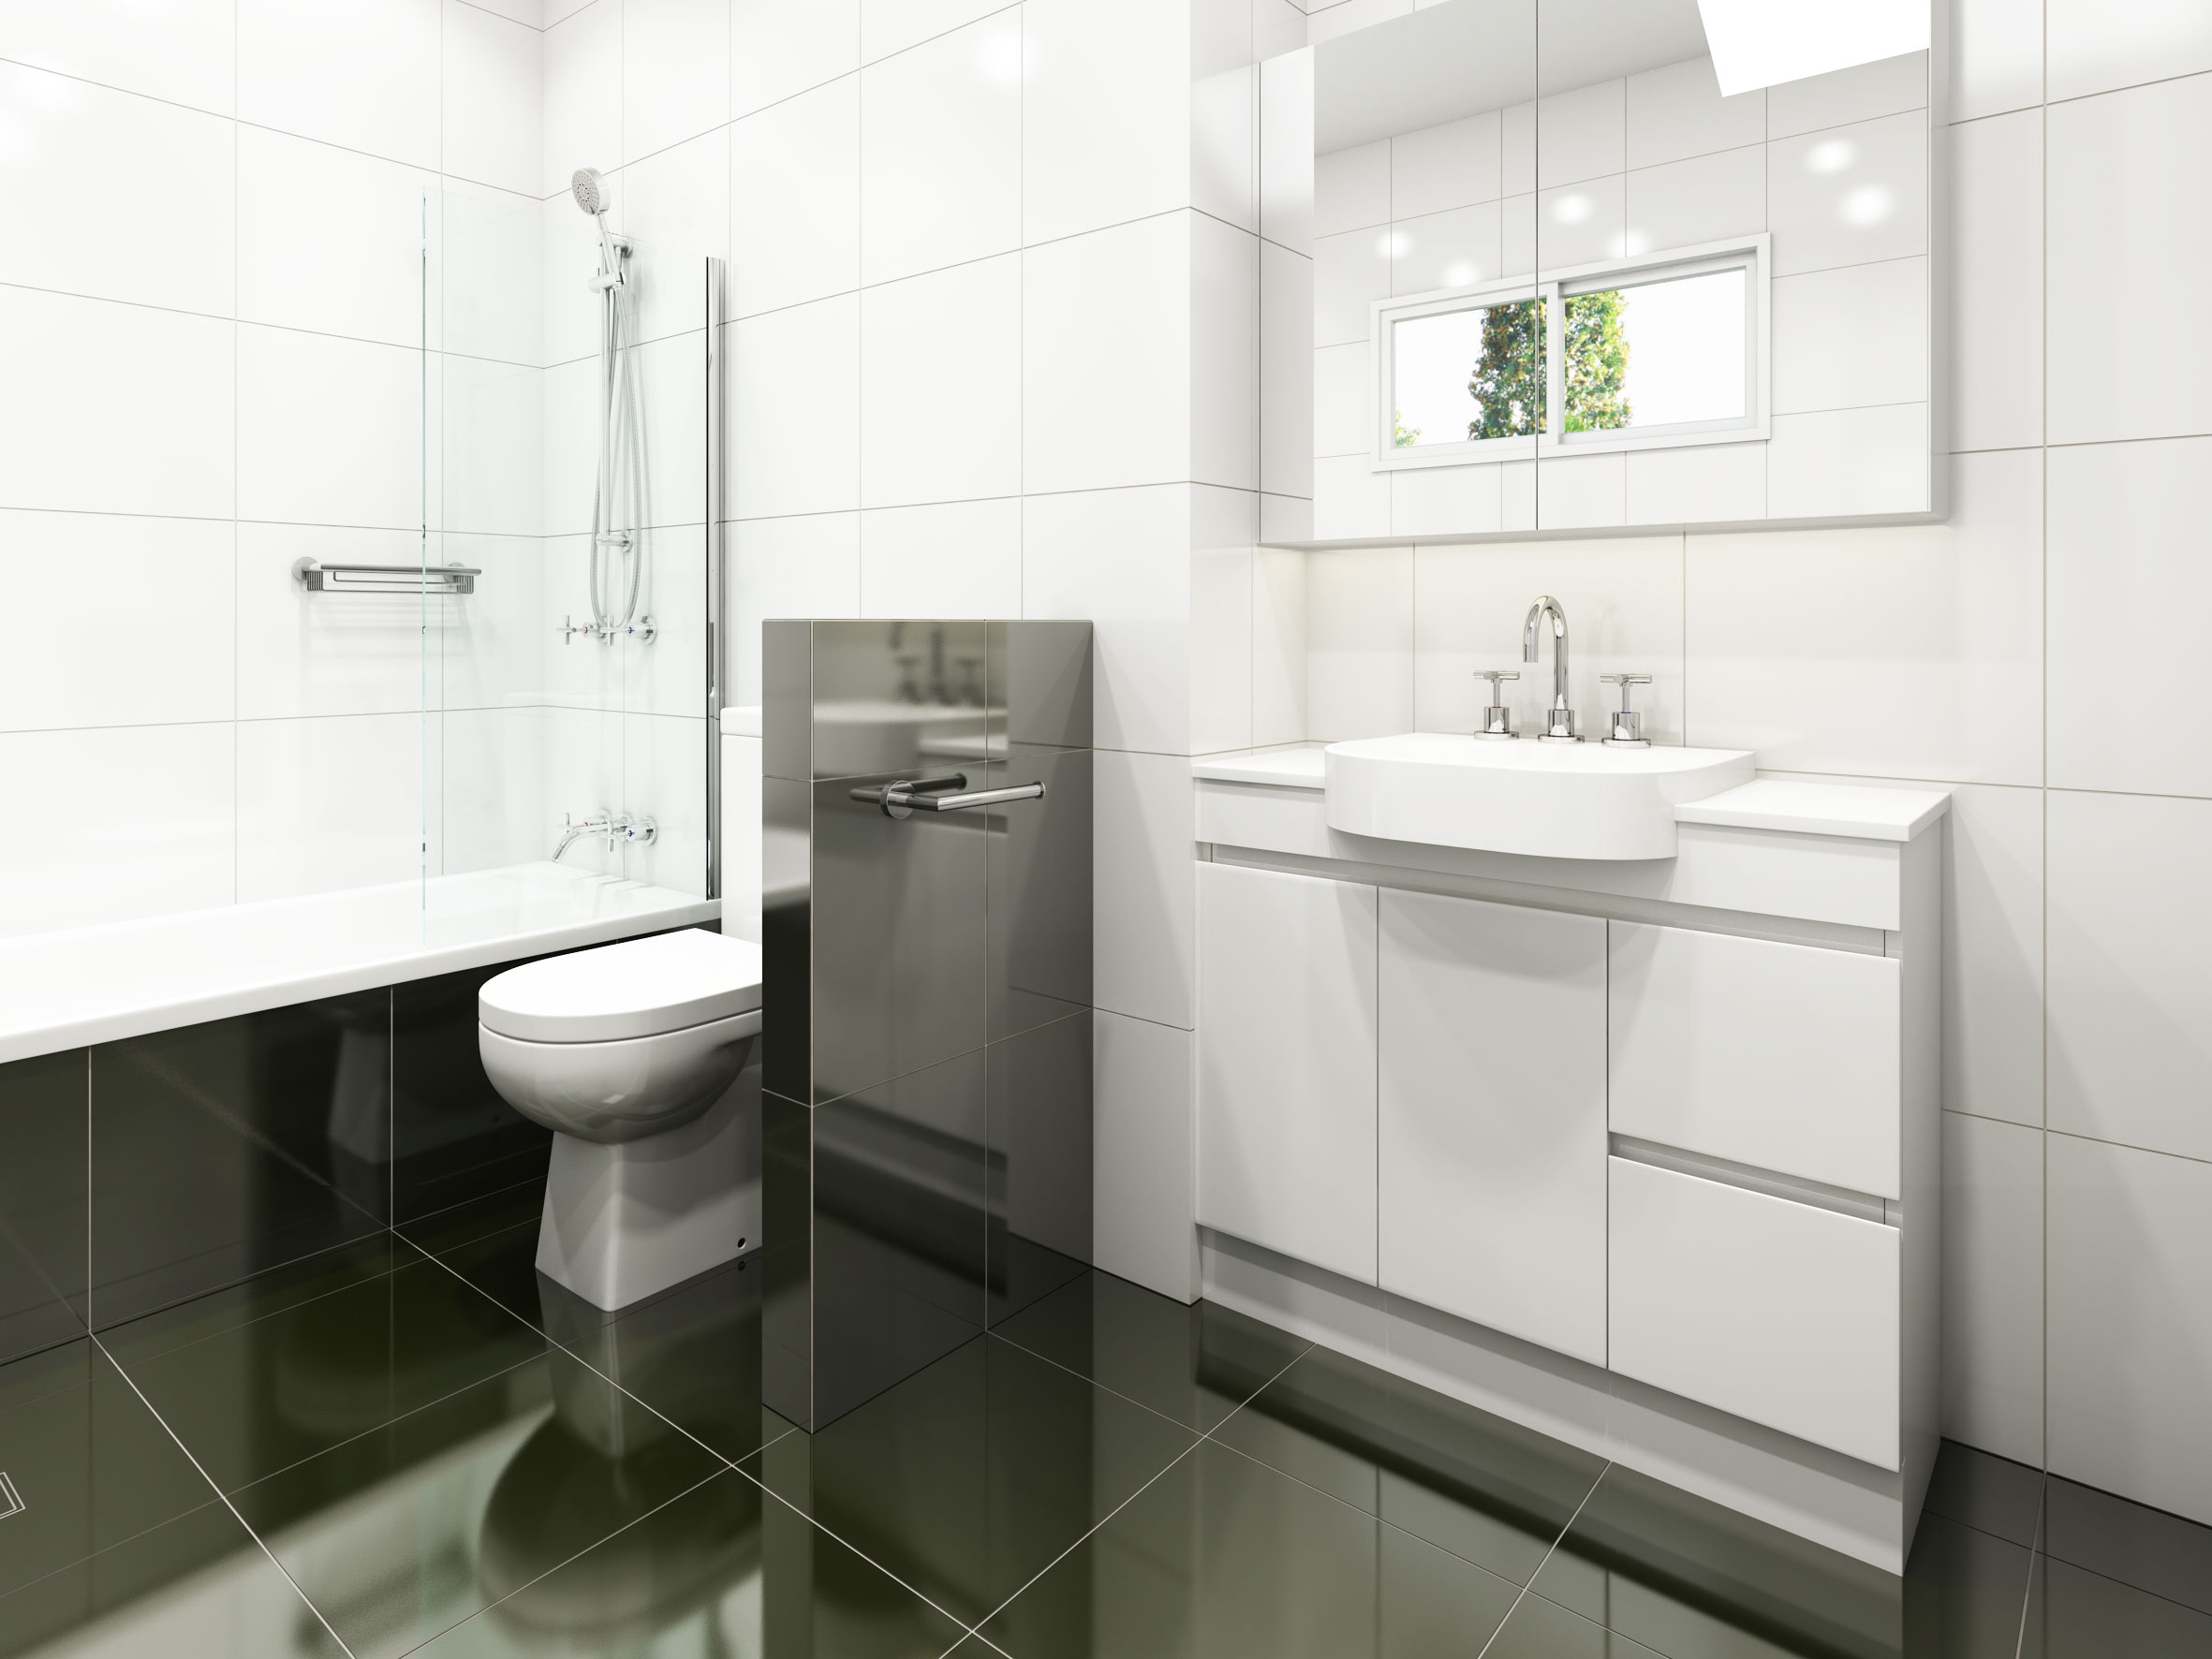 Bathroom Renovation Supplies Toowoomba : Bathroom renovation ideas